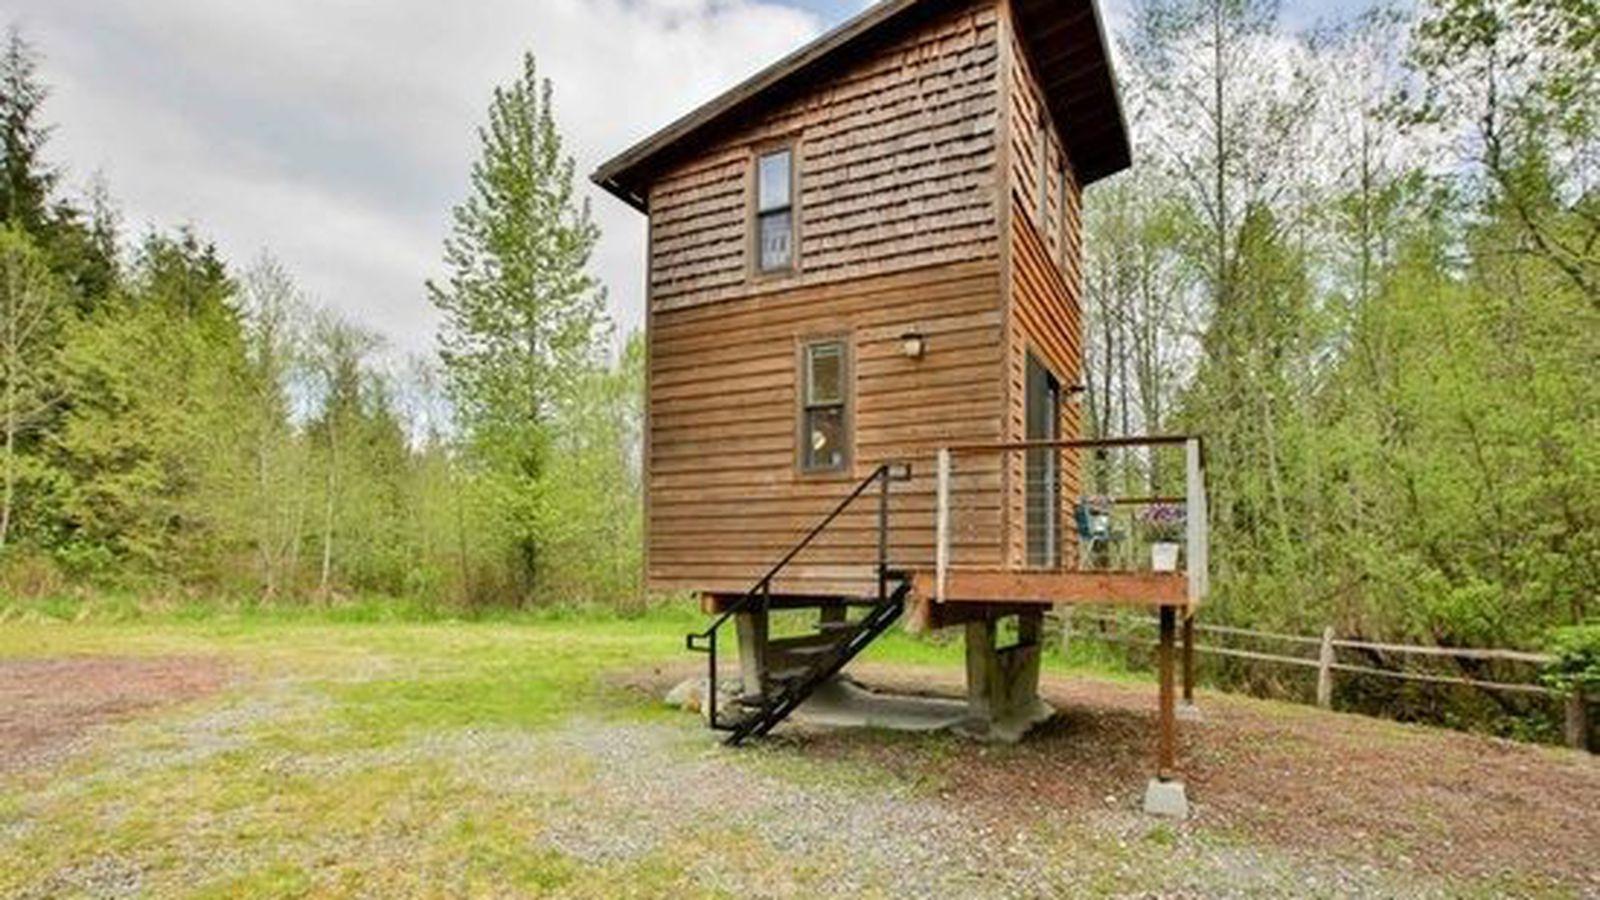 They stuck a tiny cube on stilts in arlington asking 89k for Tiny house on stilts